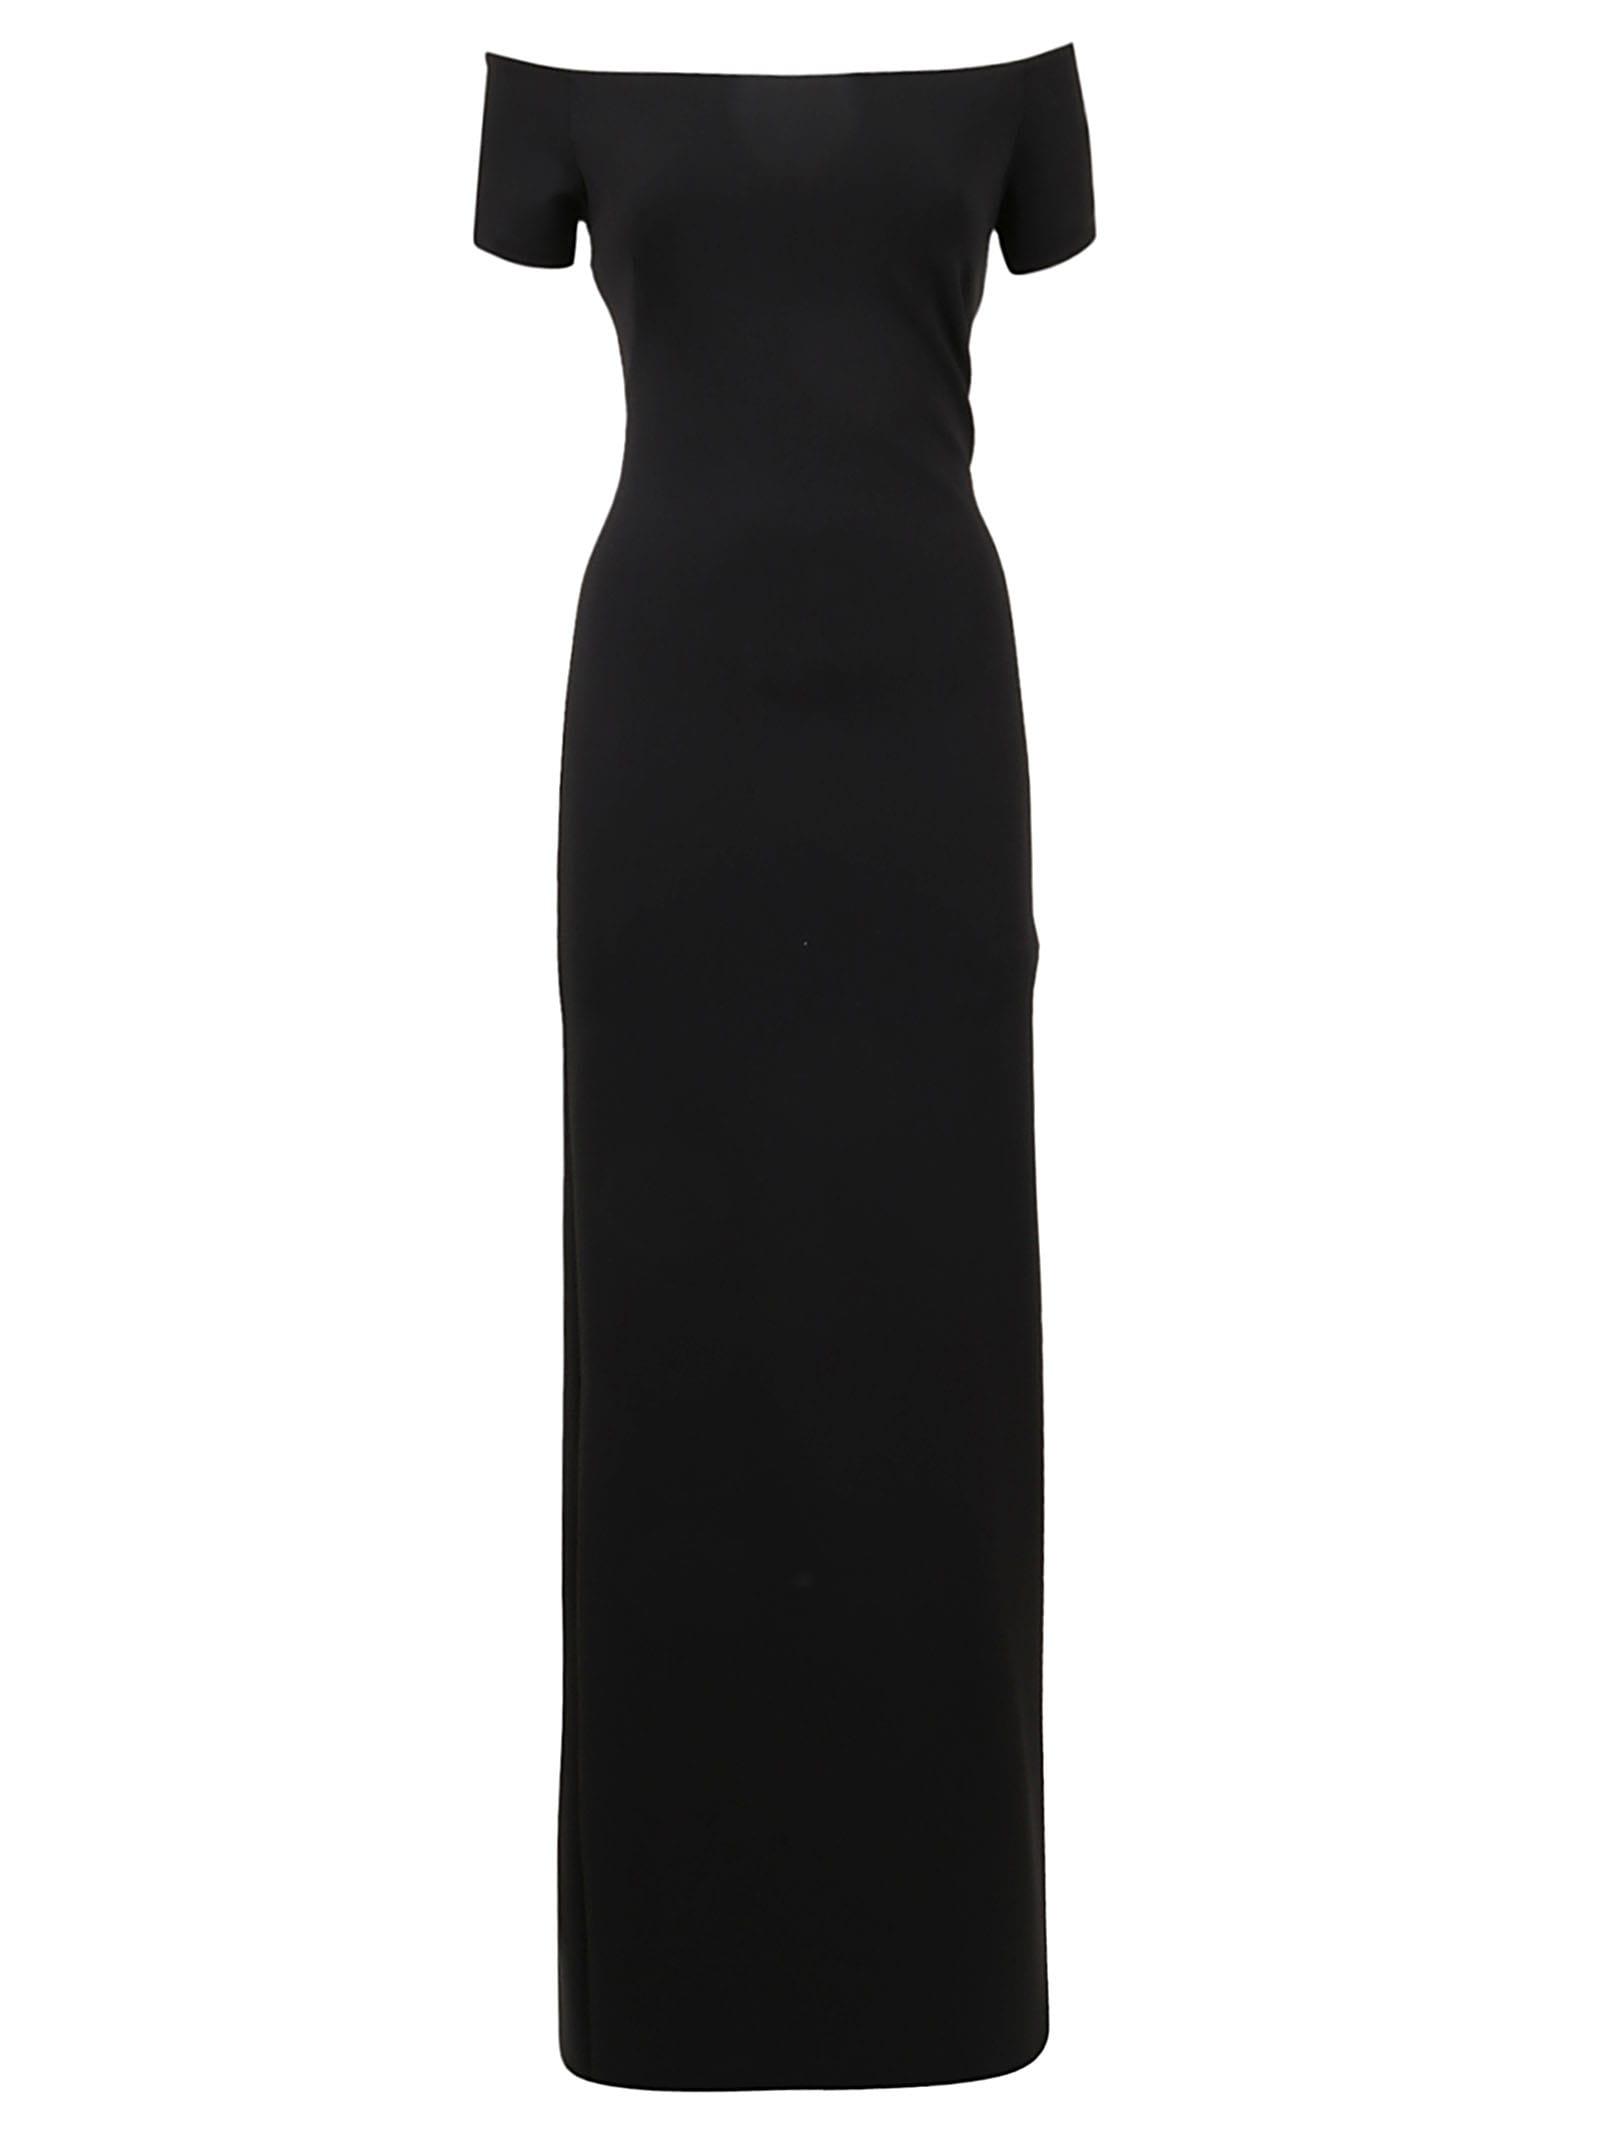 Ralph Lauren Black Label Evening Dress